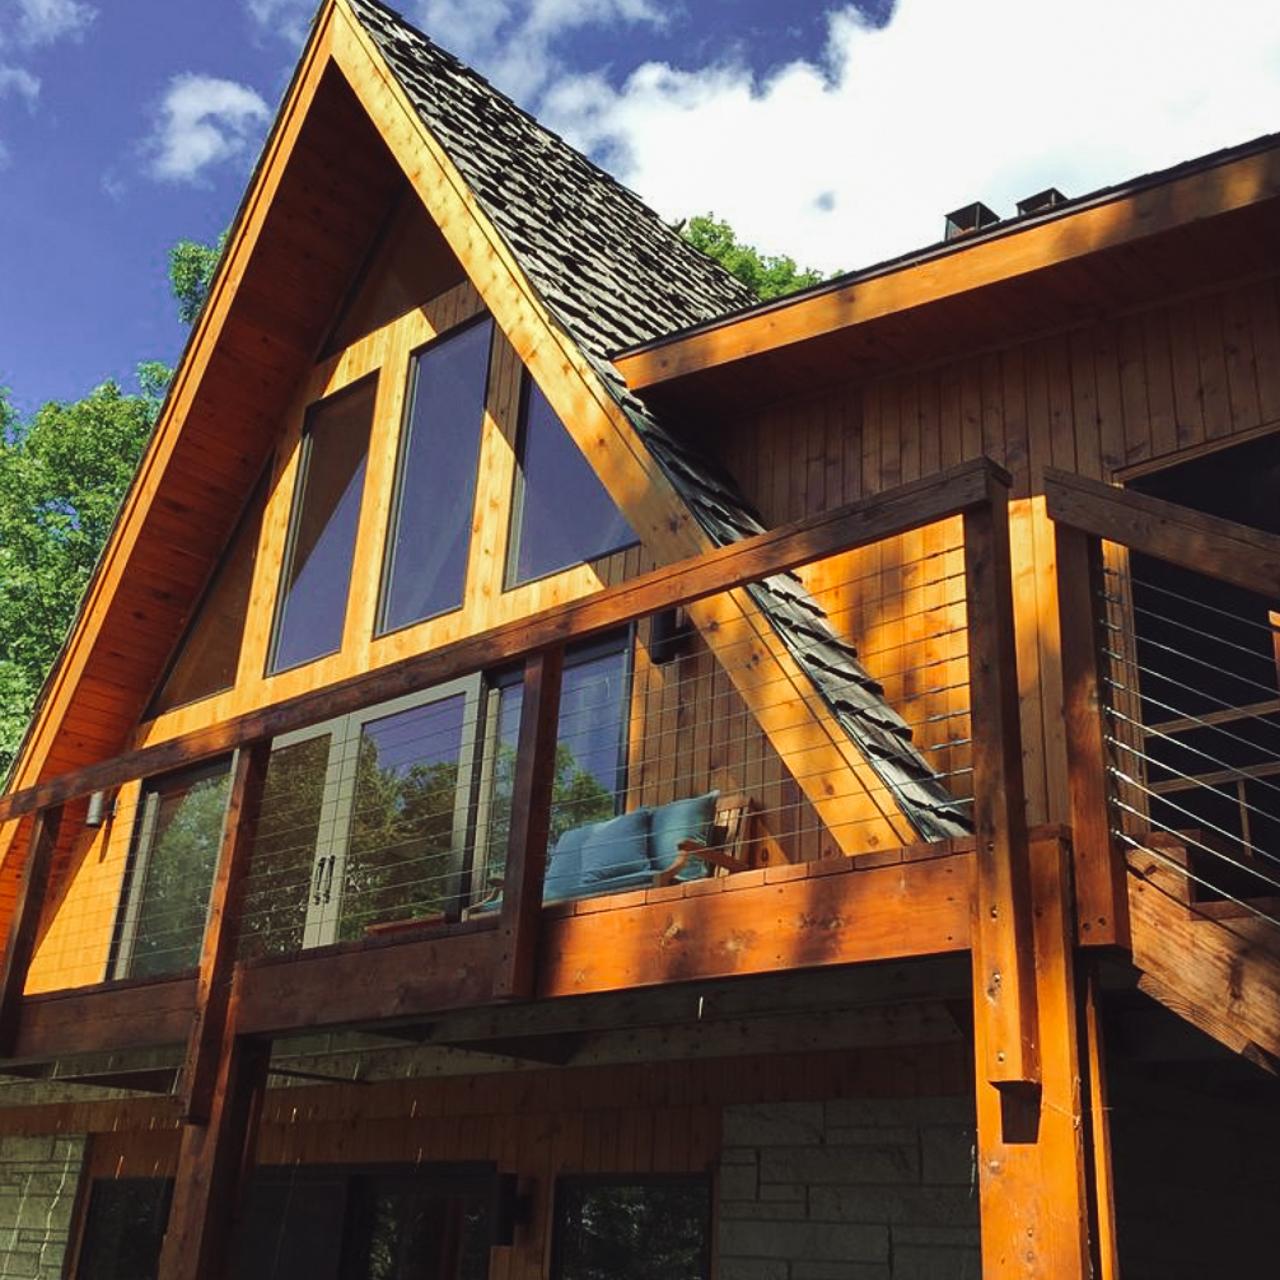 A Frame Cabin Rentals In Wisconsin Prenota online la tua casa vacanze, sarà un'esperienza unica! a frame cabin rentals in wisconsin